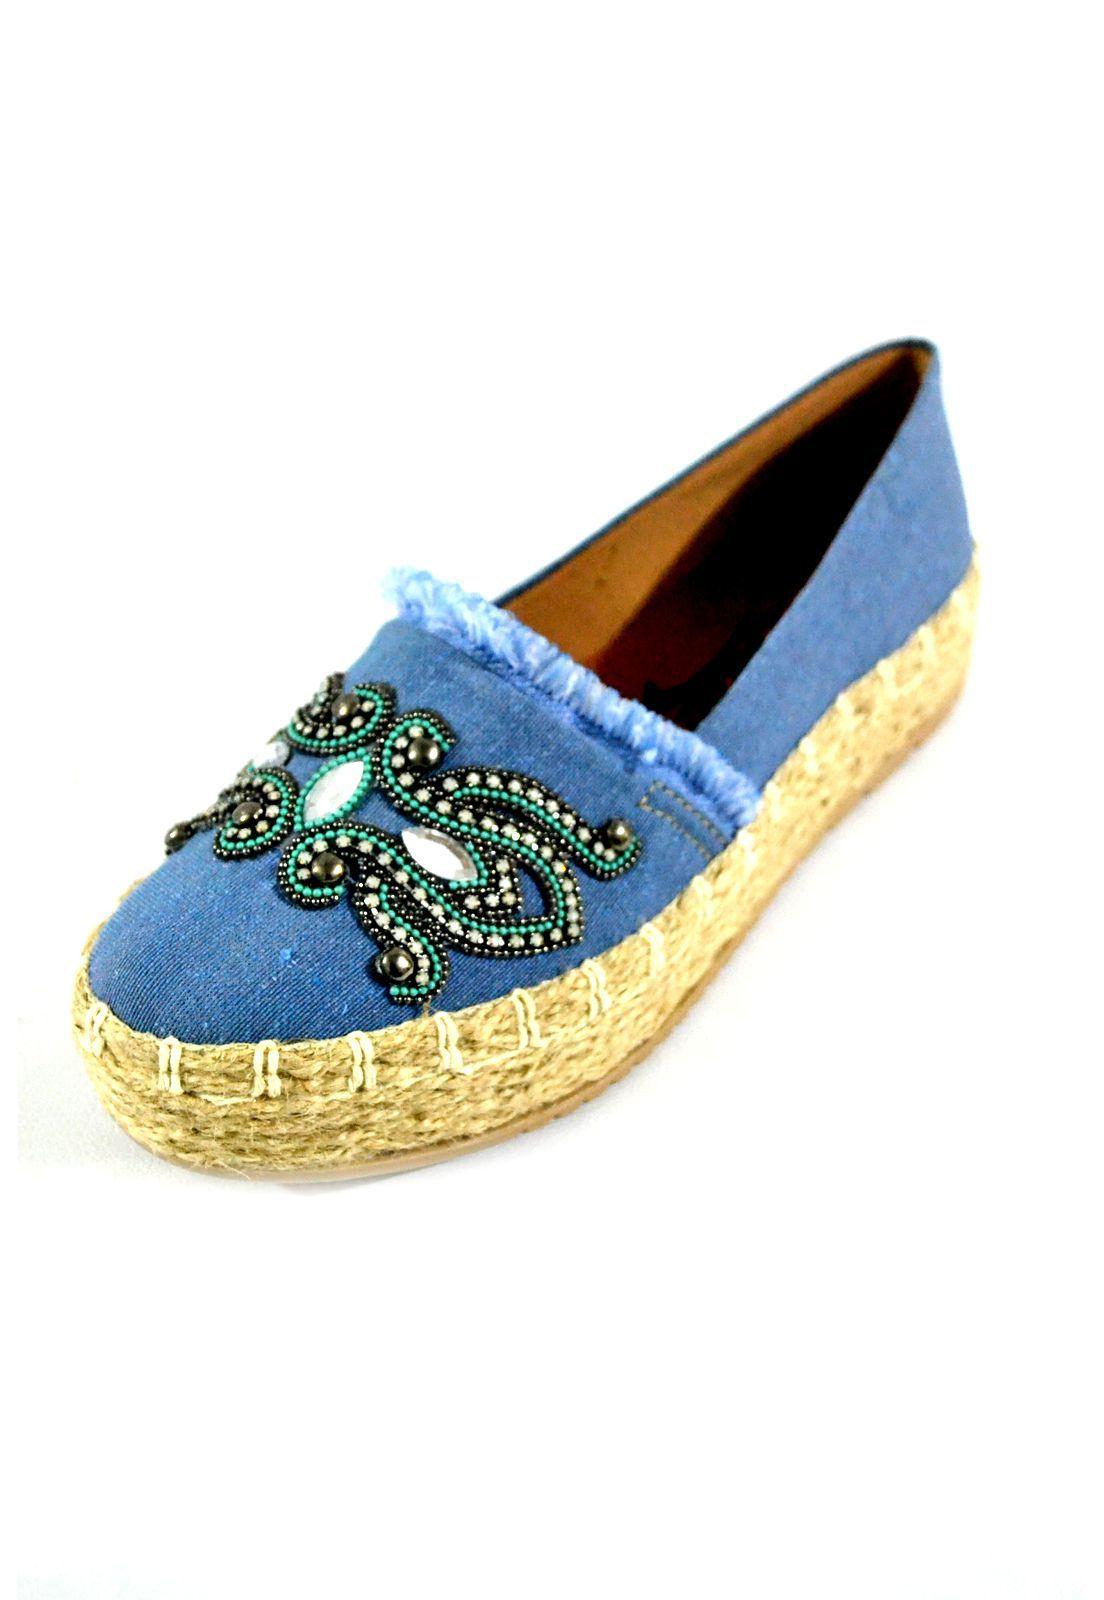 Alpargata Feminino   Prata Couro 1009904  Lona Blue